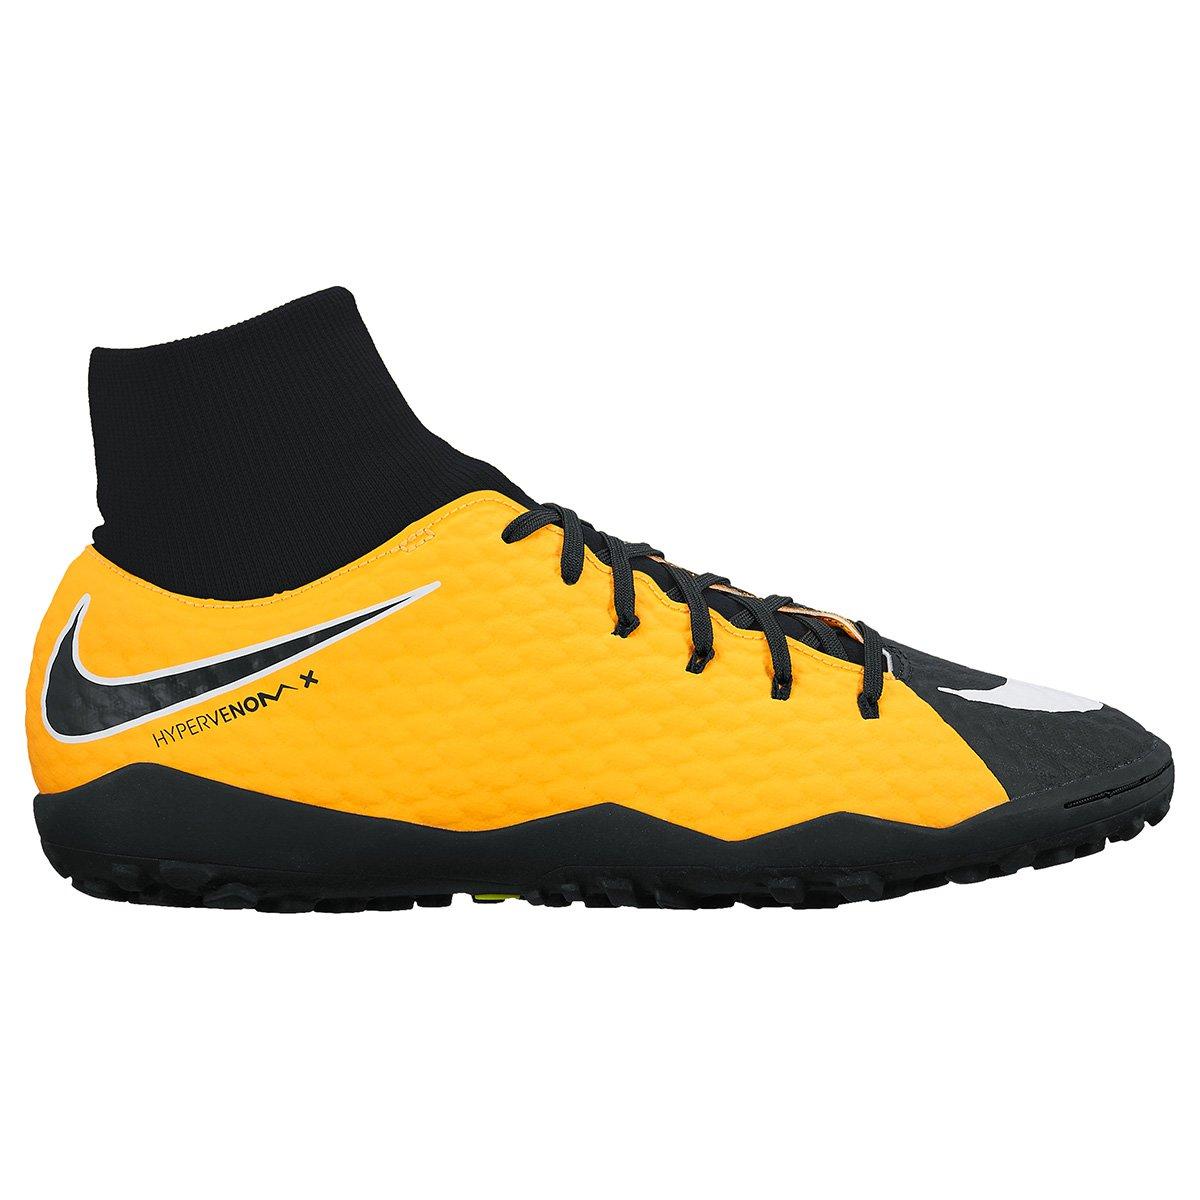 adf73c2c77278 Chuteira Society Nike Hypervenom Phelon 3 DF TF - Compre Agora ...